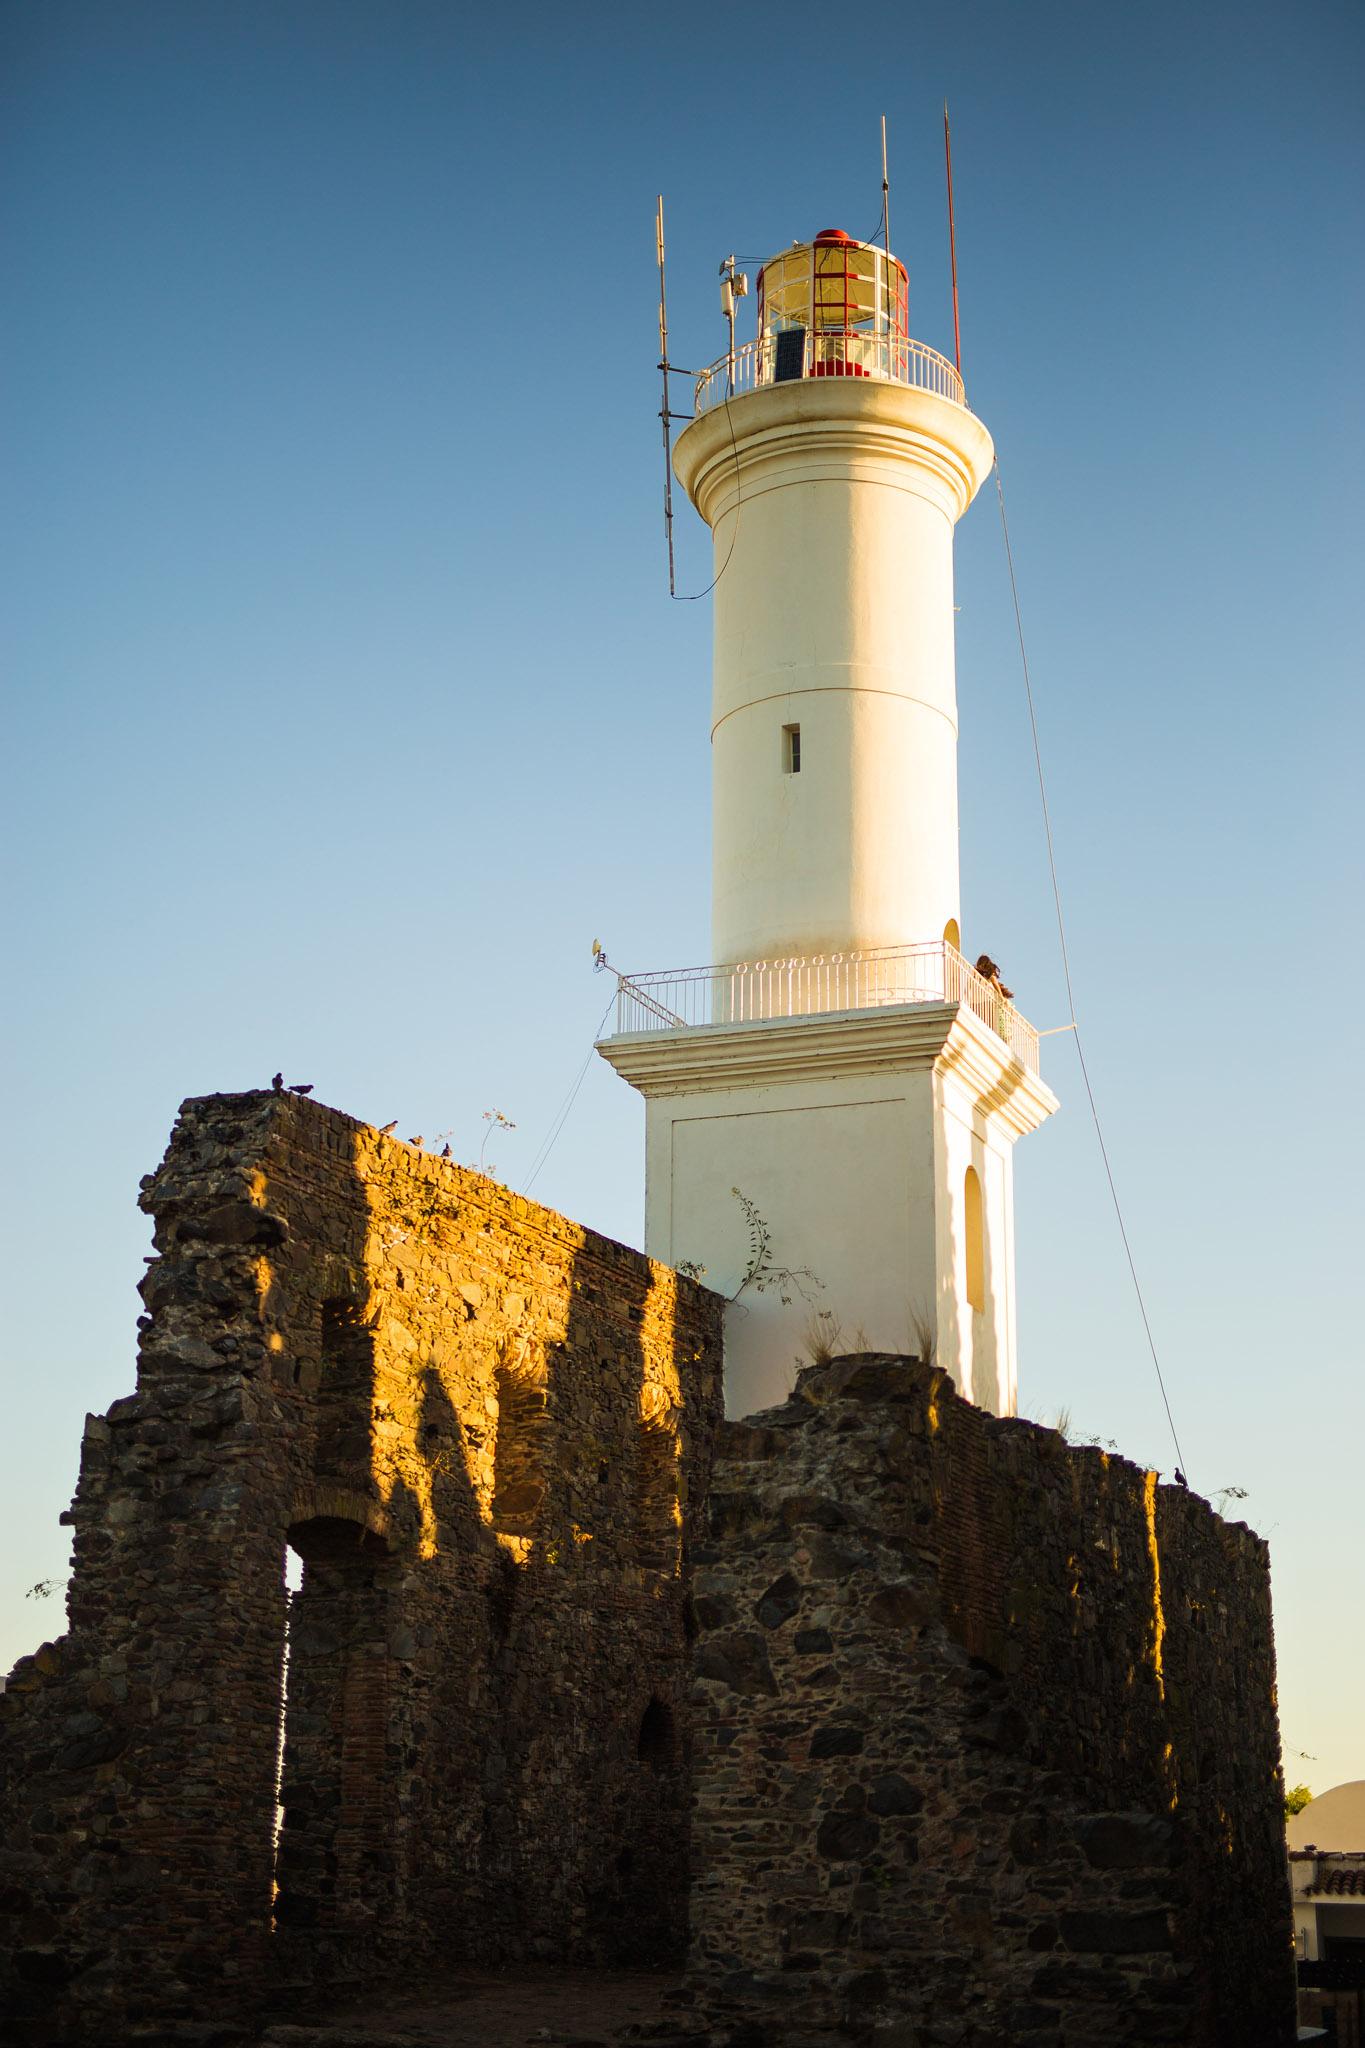 wedding-travellers-destination-photography-overlanding-south-america-uruguay-colonia-del-sacramento-lighthouse